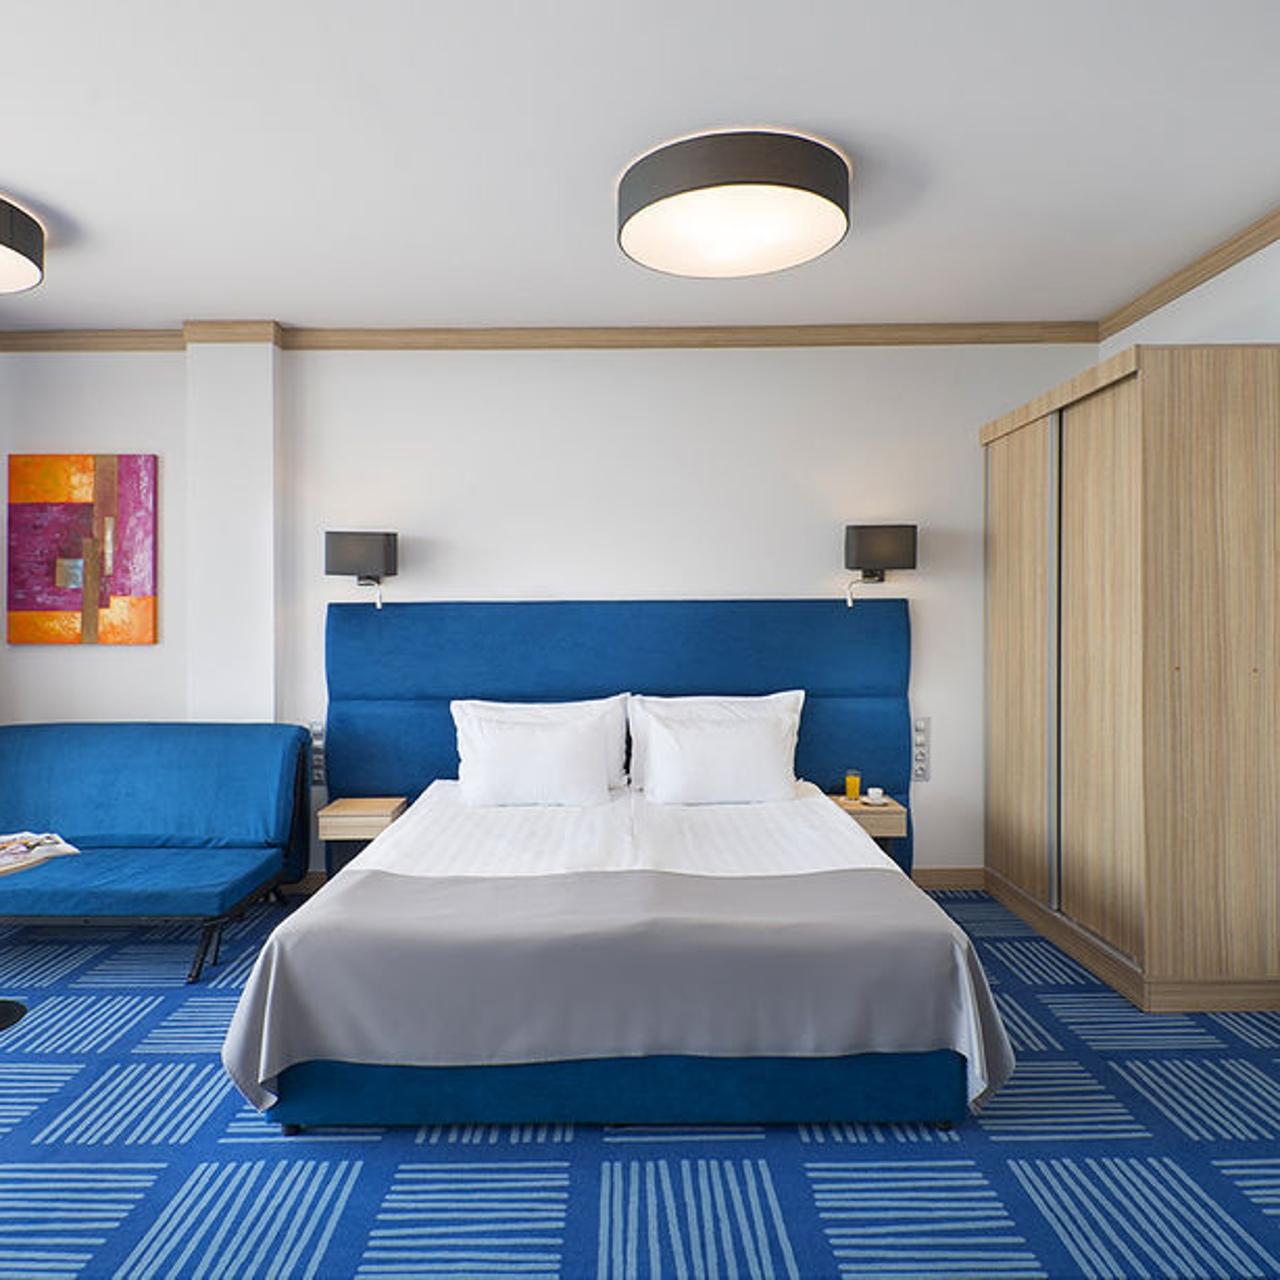 Hvd Viva Club Hotel All Inclusive 4 Hrs Star Hotel In Varna